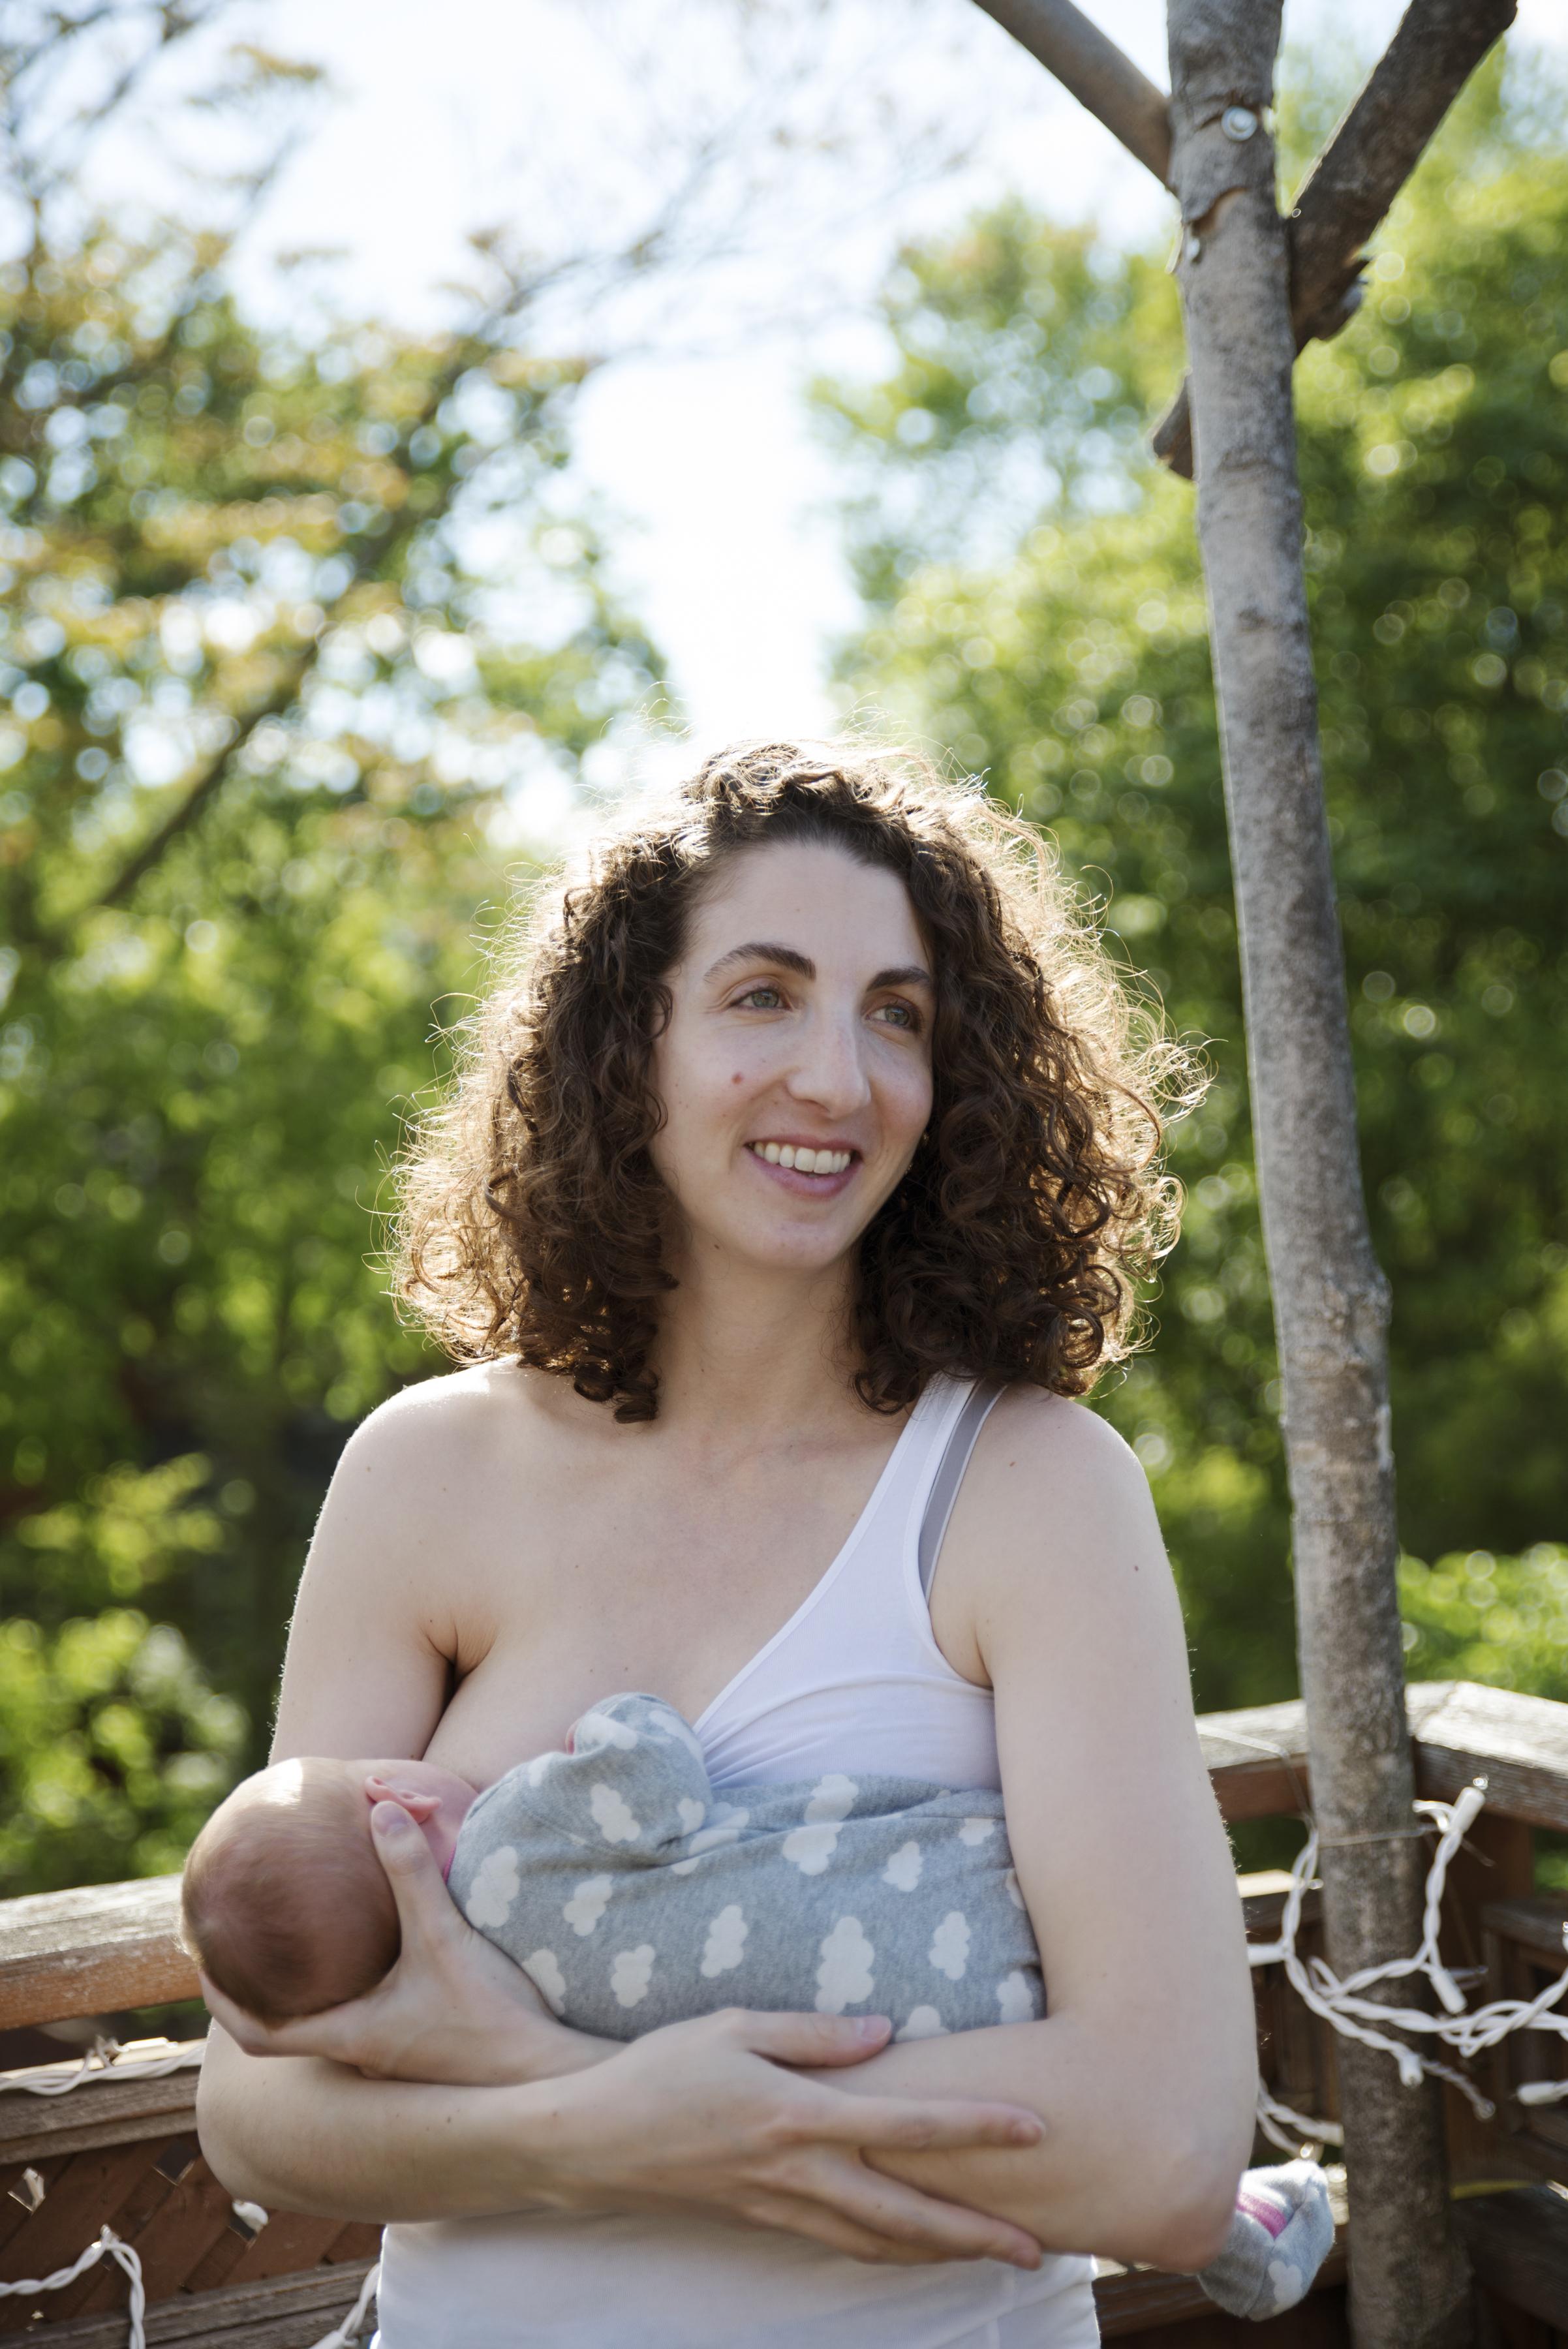 RosewoodWeddingPhotos-Newborn-Toronto-Documentary-DocumentaryNewborn-TorontoNewbornPhotographer-Lifestyle-Breastfeeding-NormalizeBreastfeeding